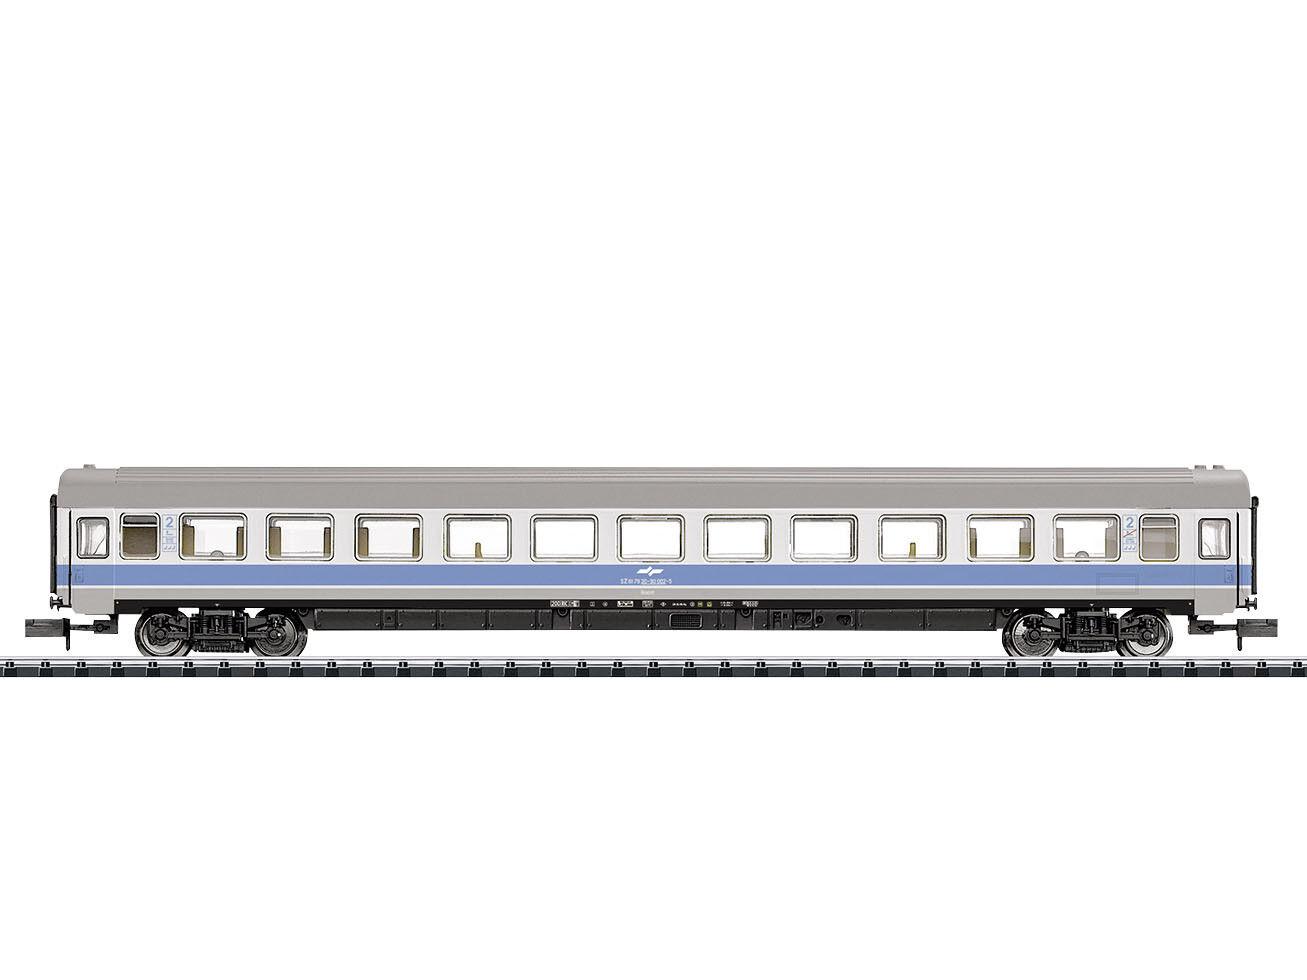 Minitrix 15591-vagoni treno rapido carro Mimara SZ EP. IV-Spur N-NUOVO